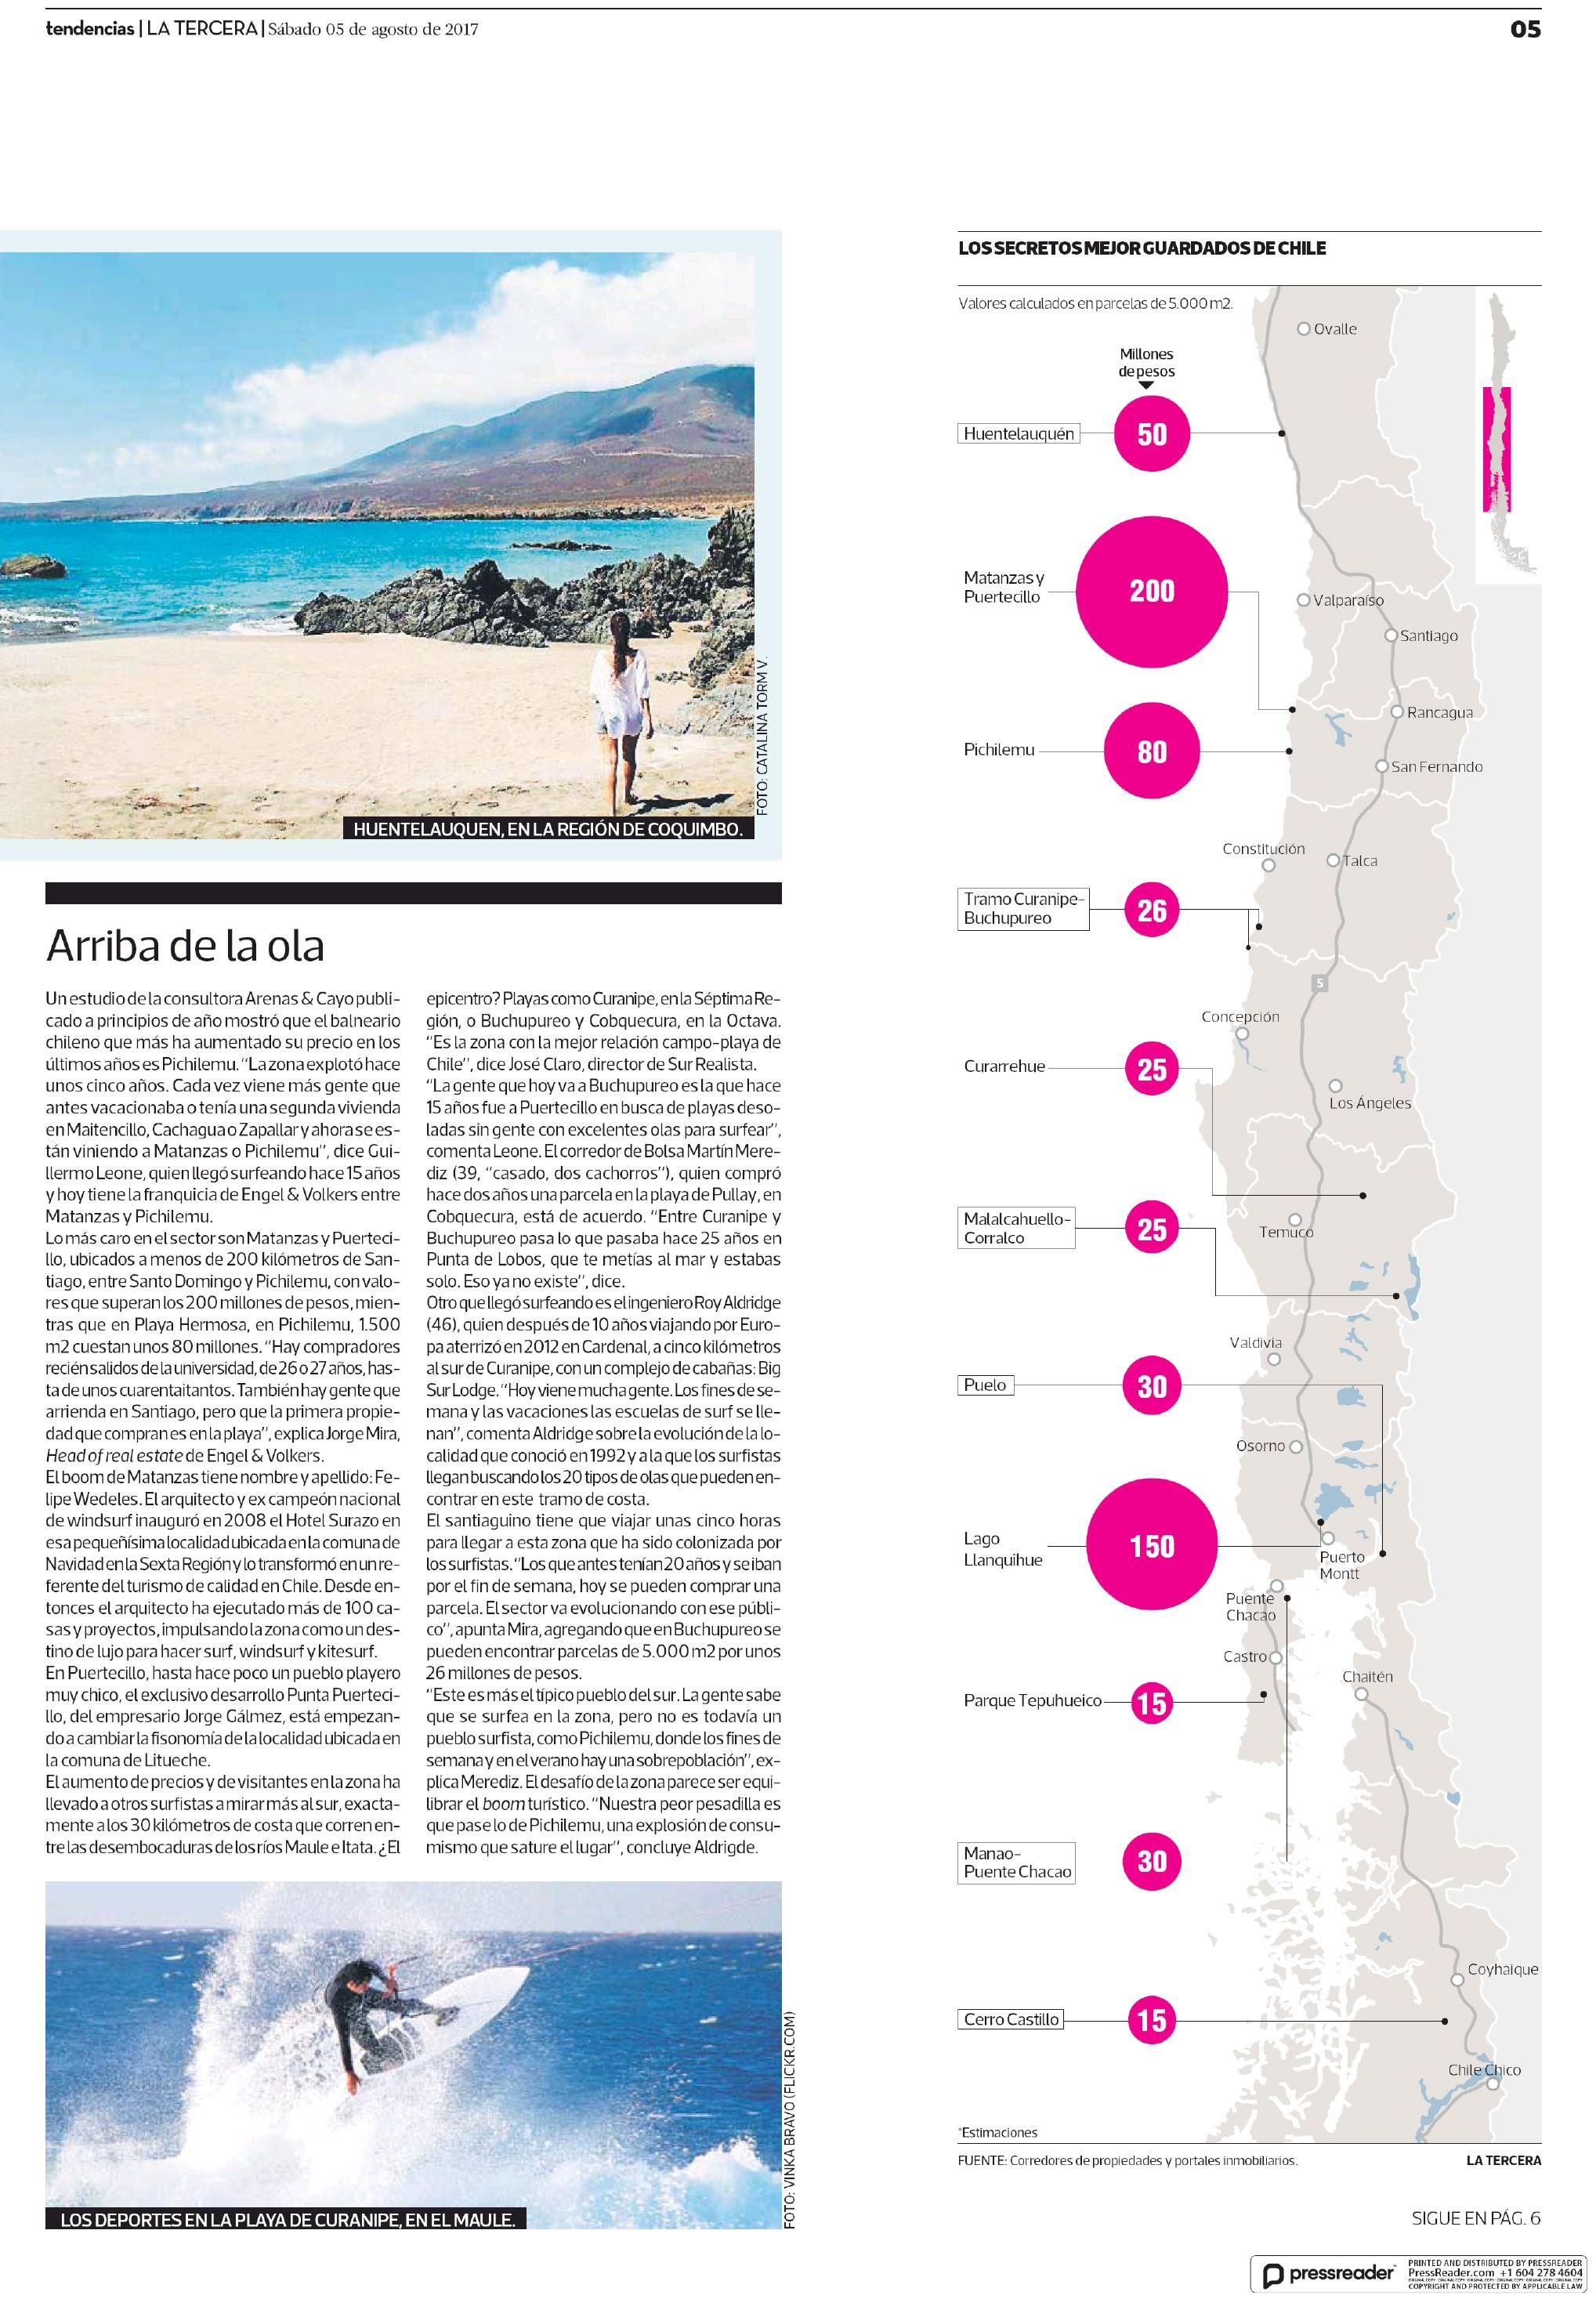 la-tercera-destinos-top-chile